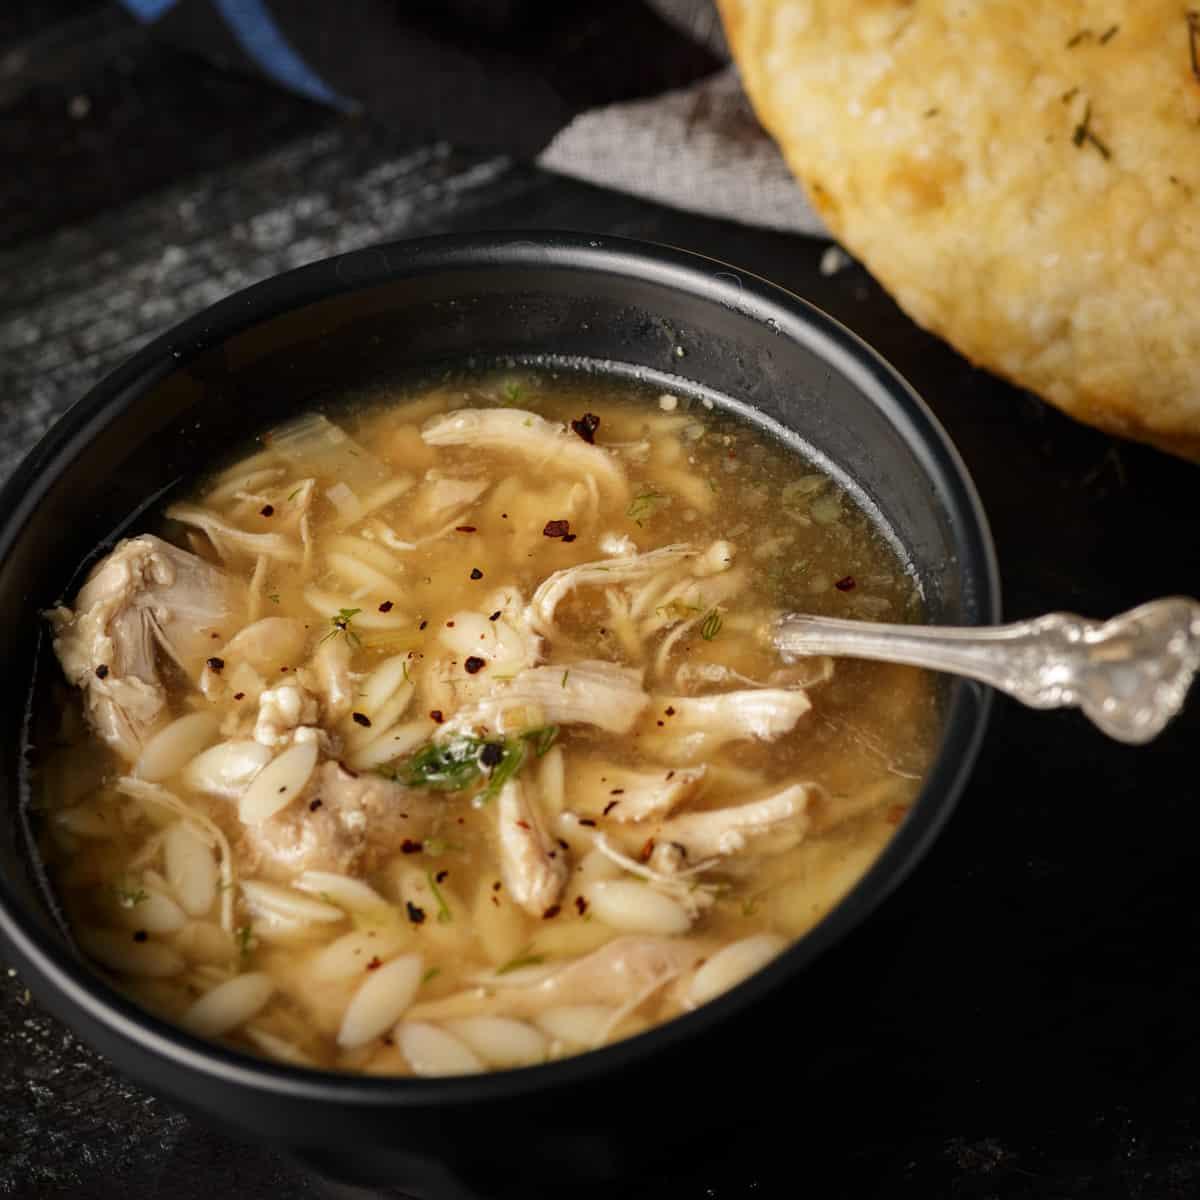 A bowl of lemon orzo chicken soup